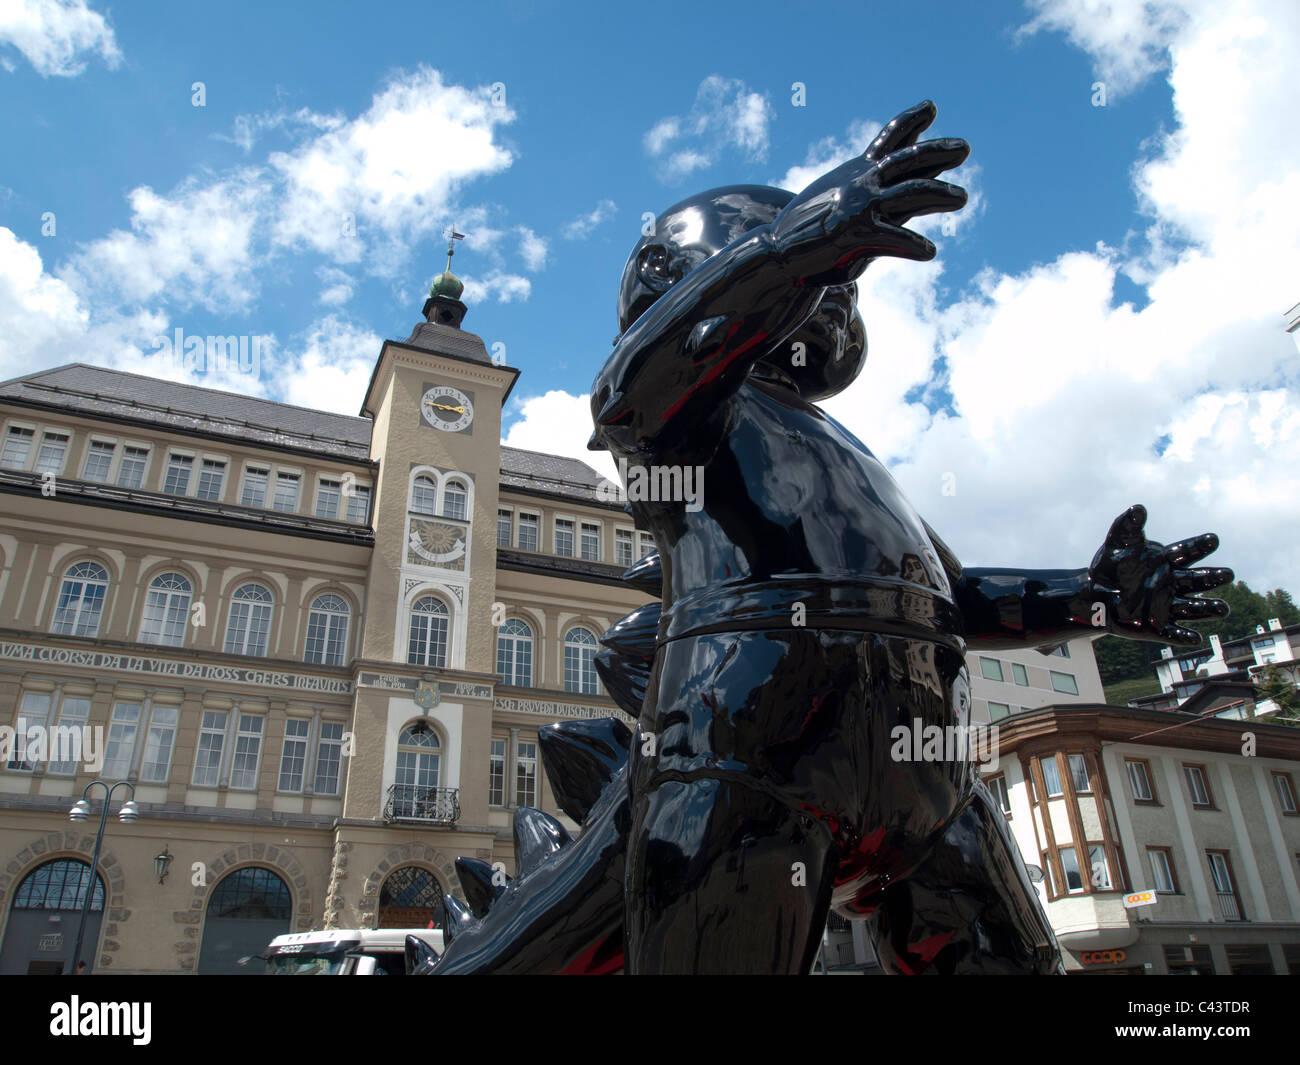 Engadin, pedestrian precinct, mall, Graubunden, Grisons, Hanselmann, art, skill, luxury, Switzerland, Europe, sculpture, - Stock Image